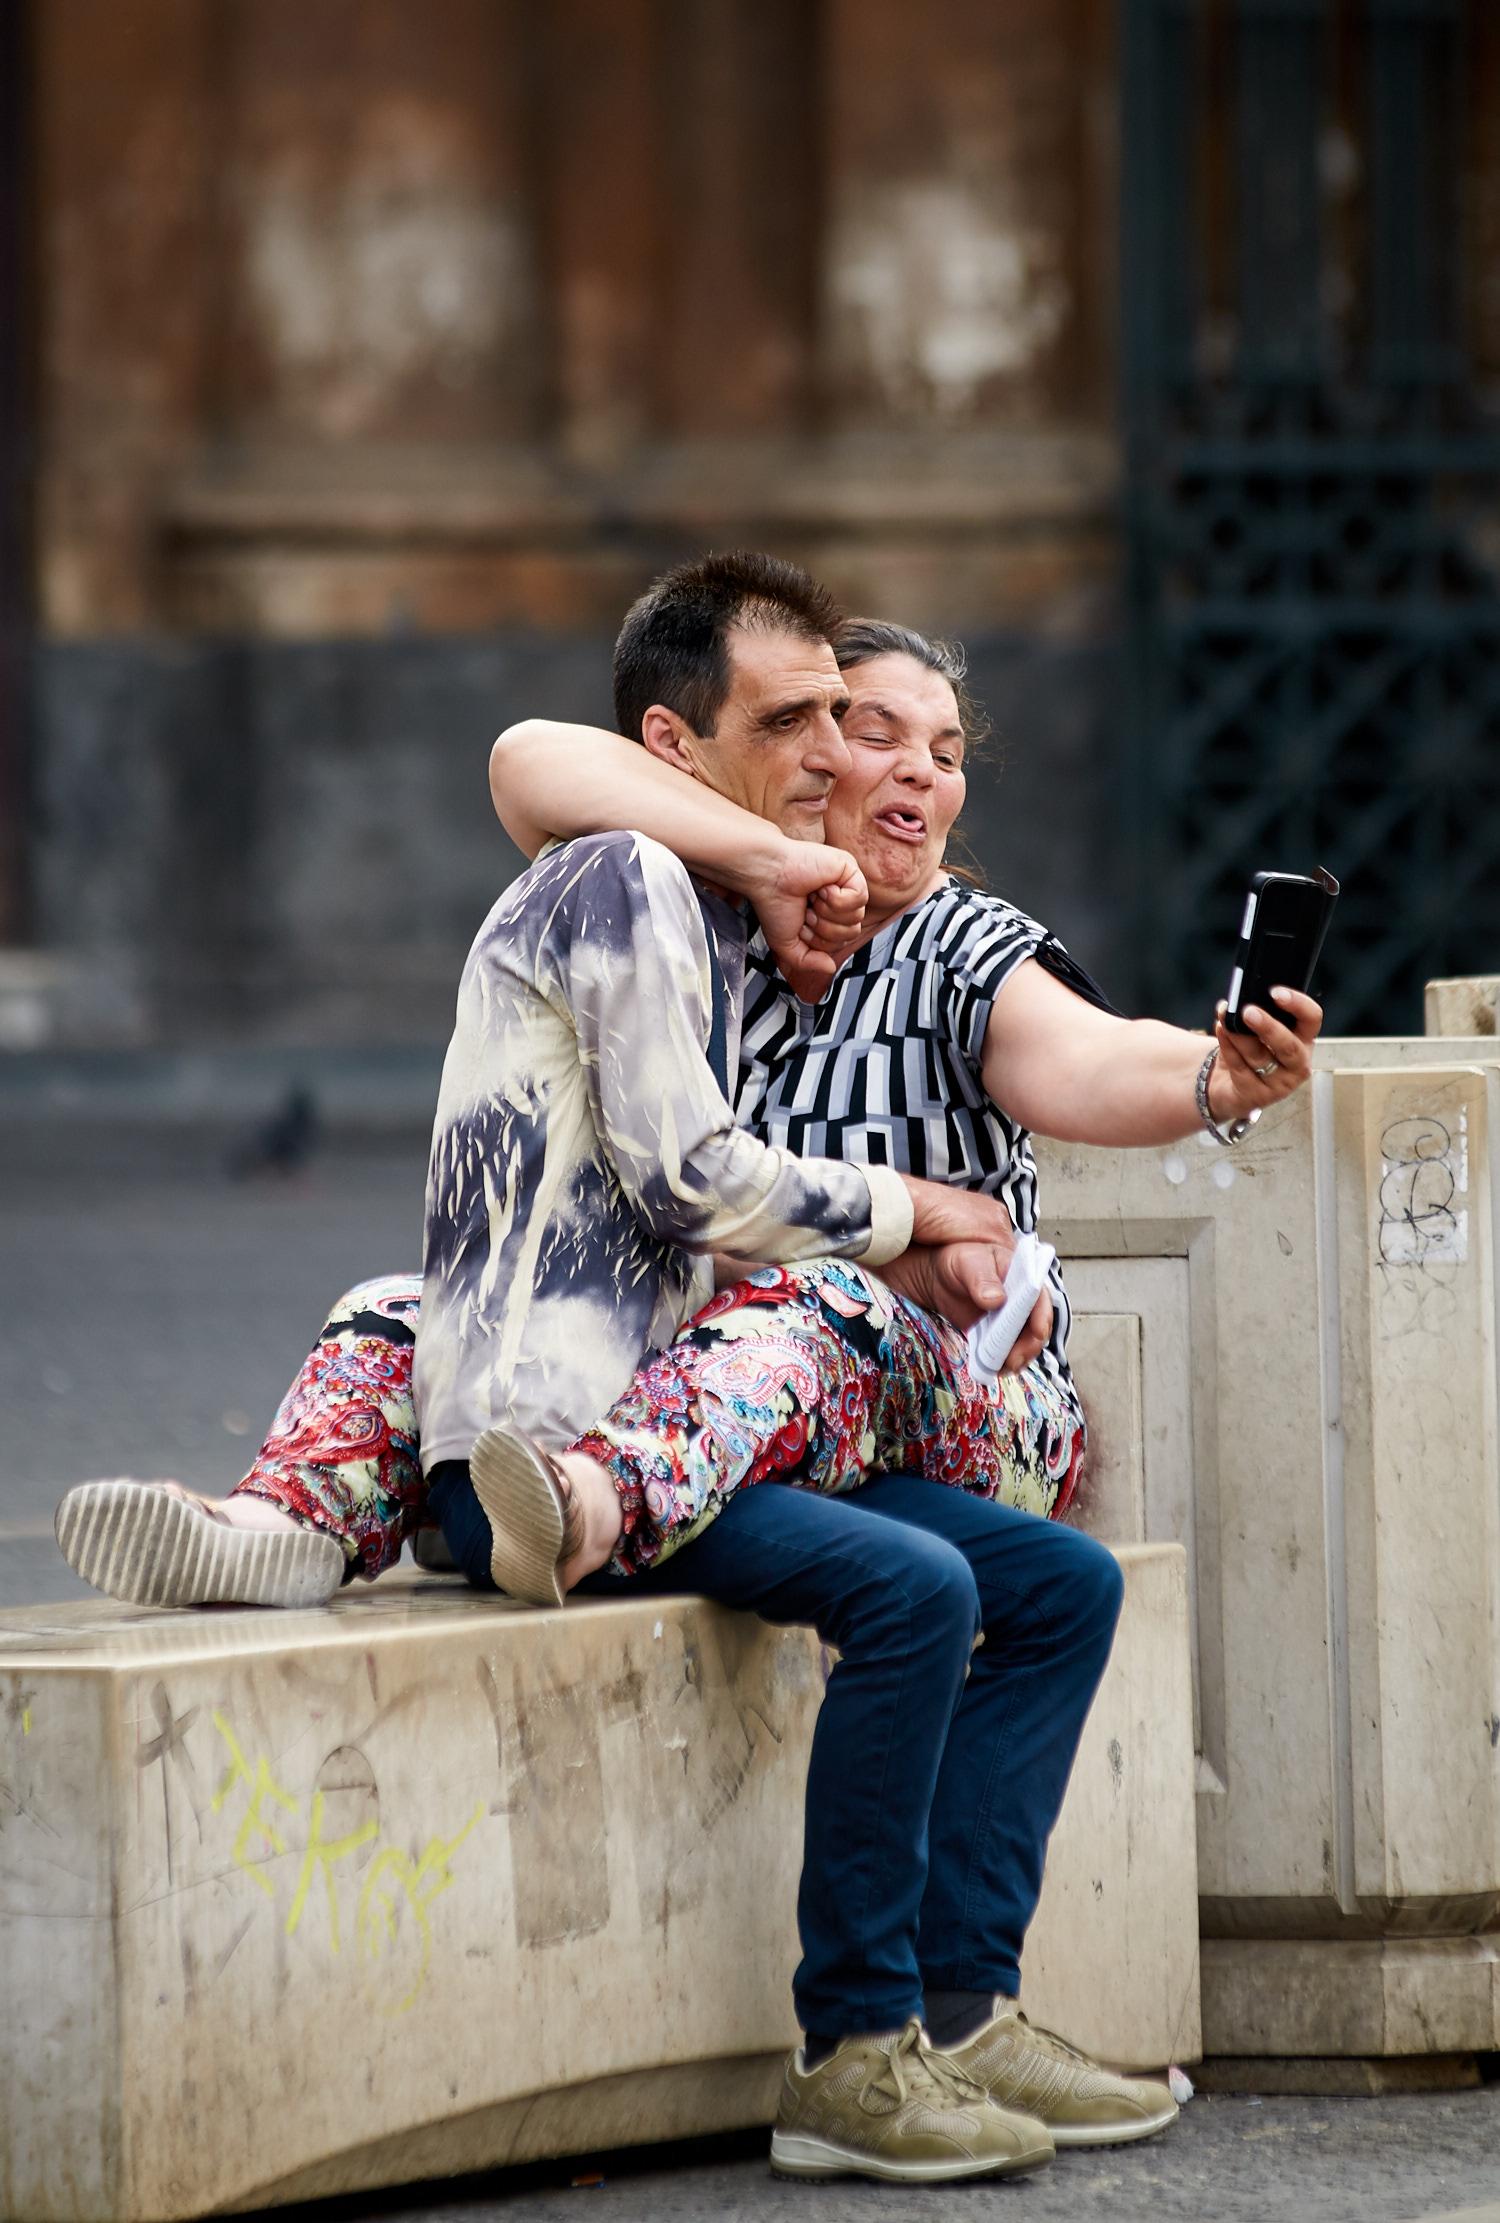 Lovebirds selfie...